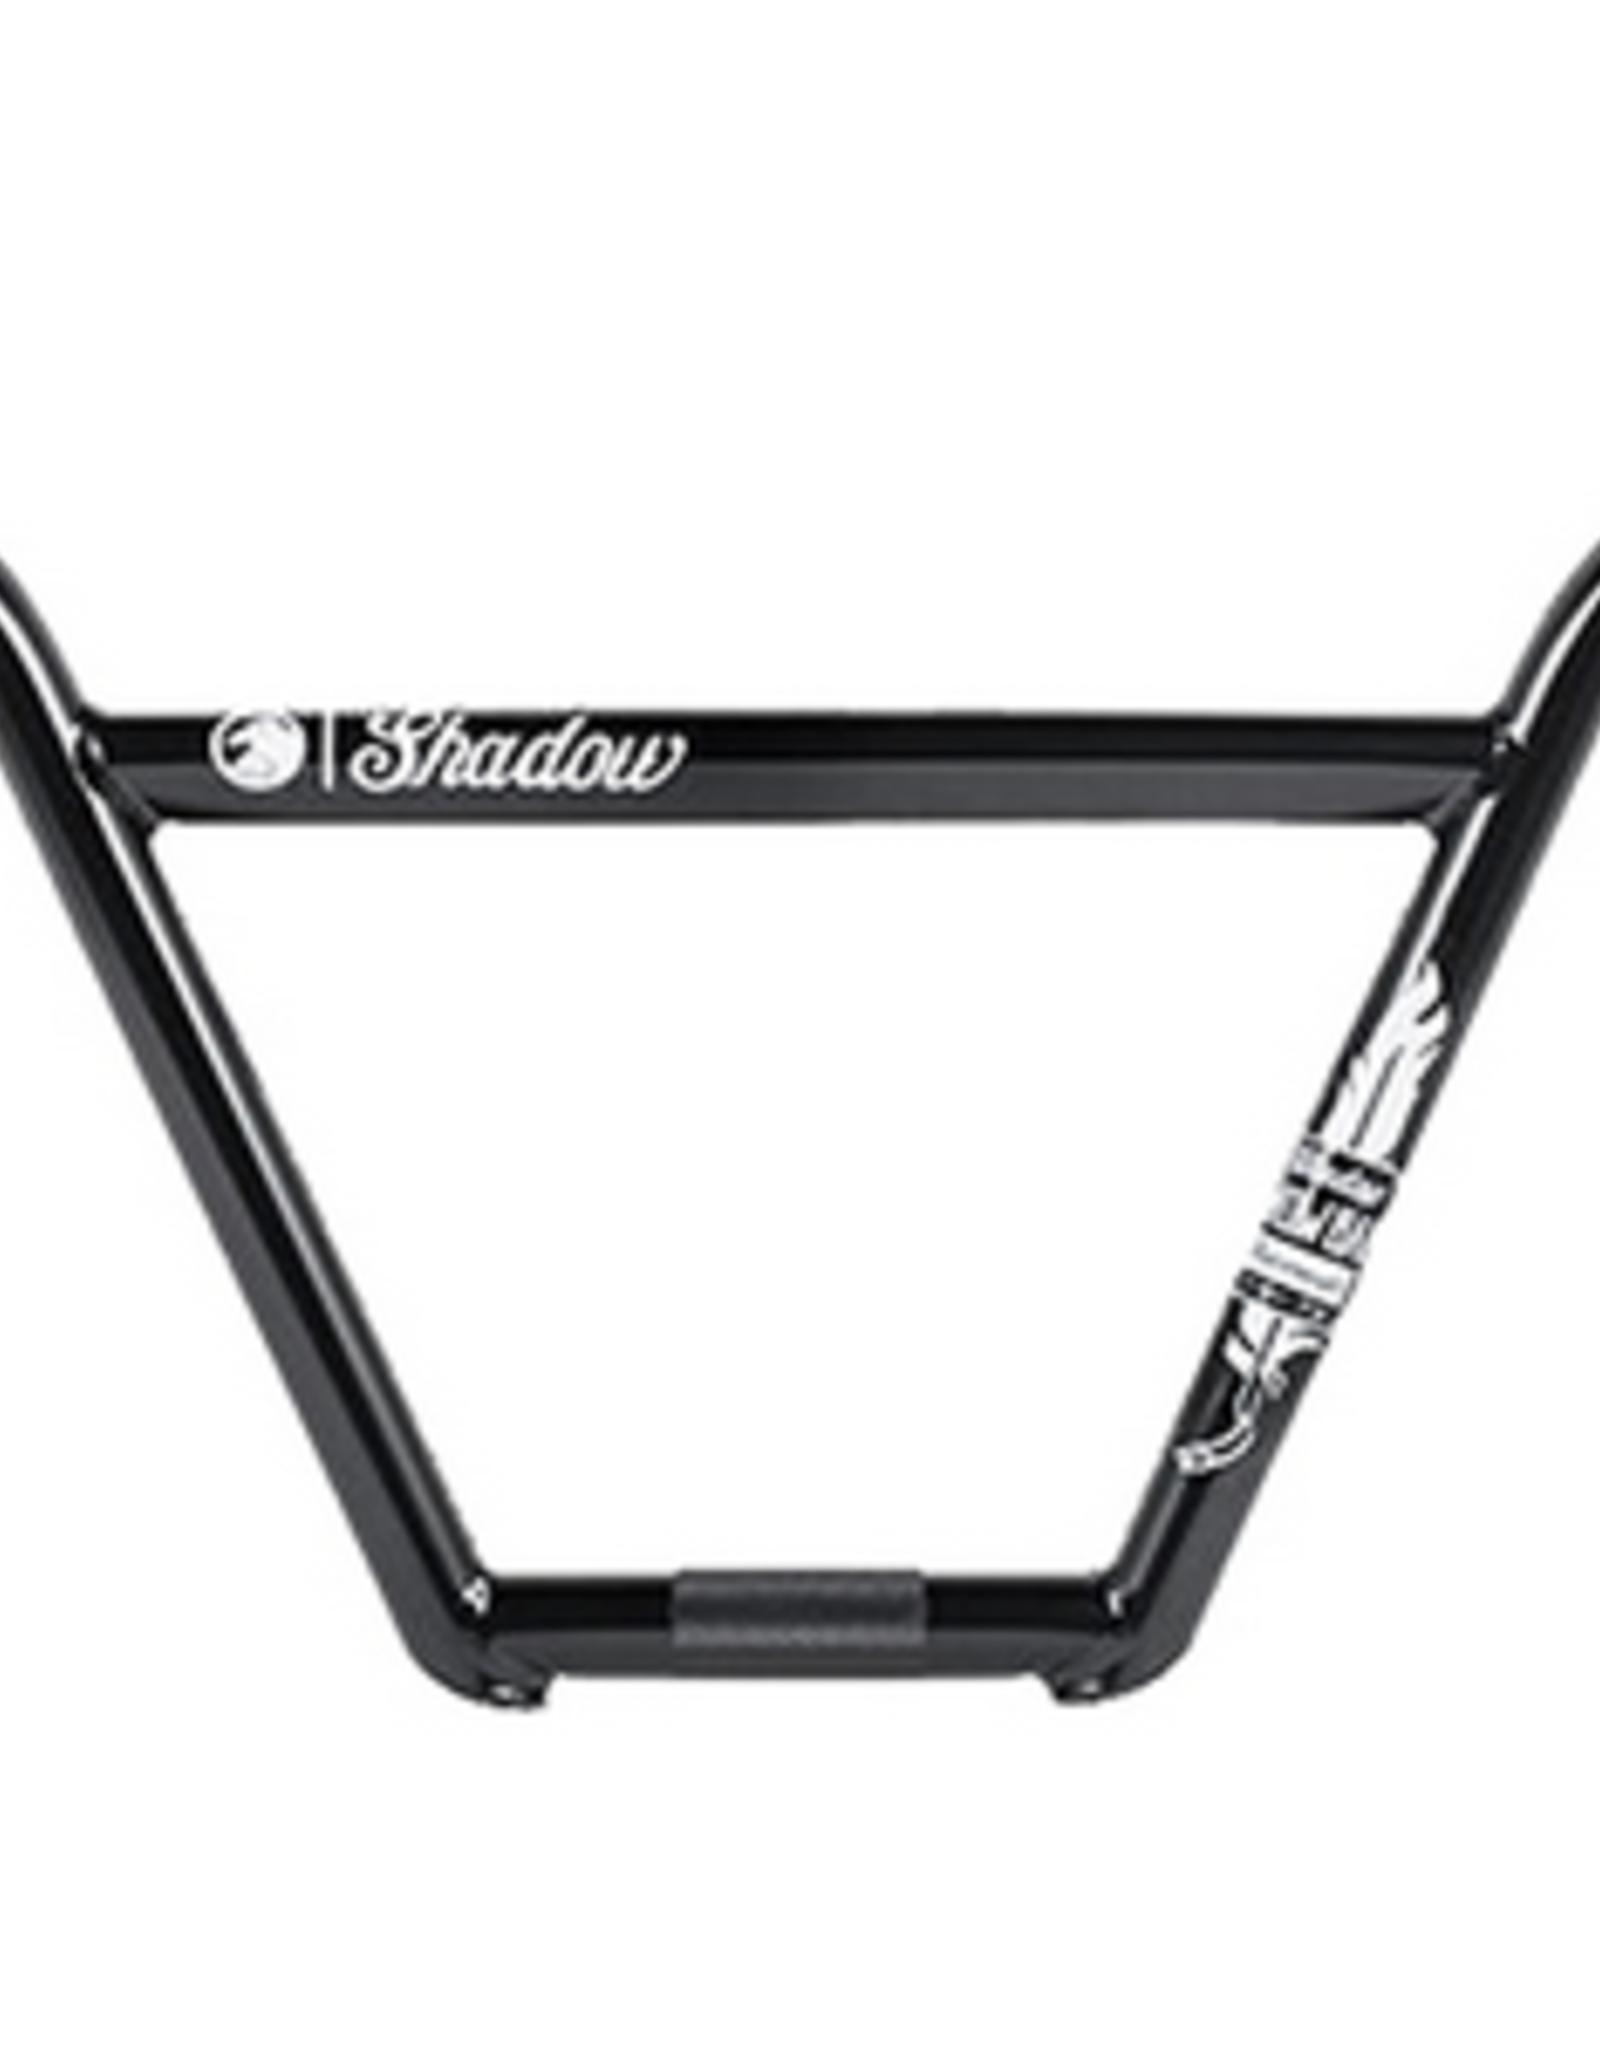 "SHADOW TSC SHADOW FW CROWBAR 9.10"" 4 PIECE BMX BARS MATTE BLACK"